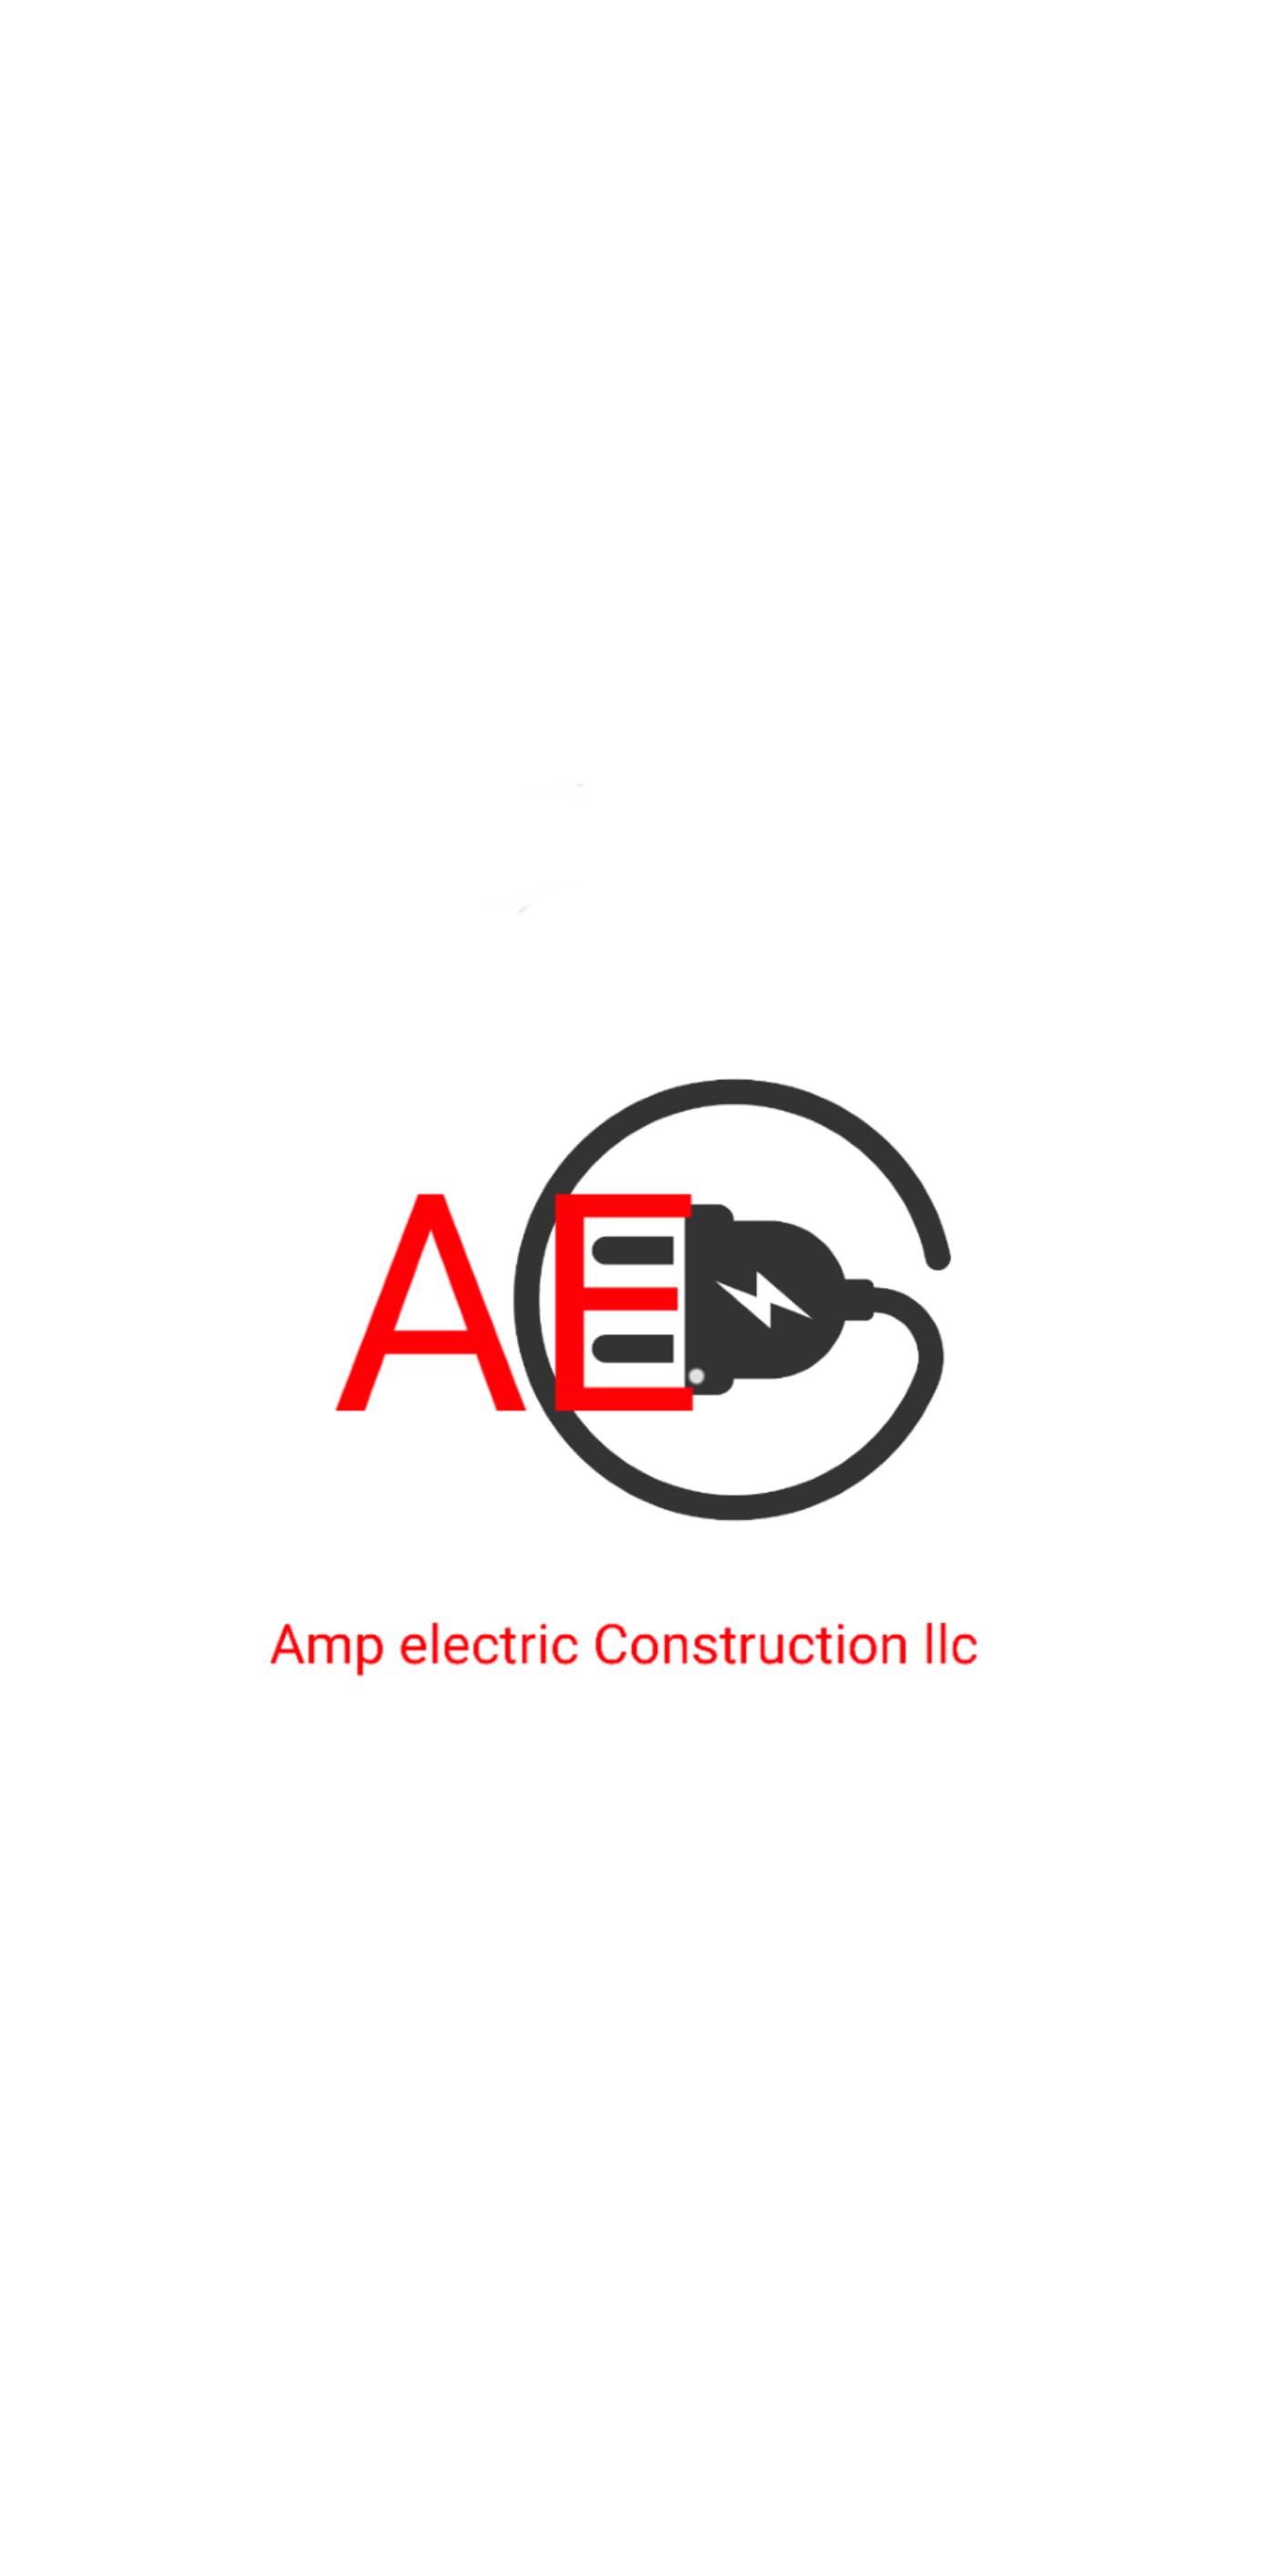 Amp Electric Construction Llc